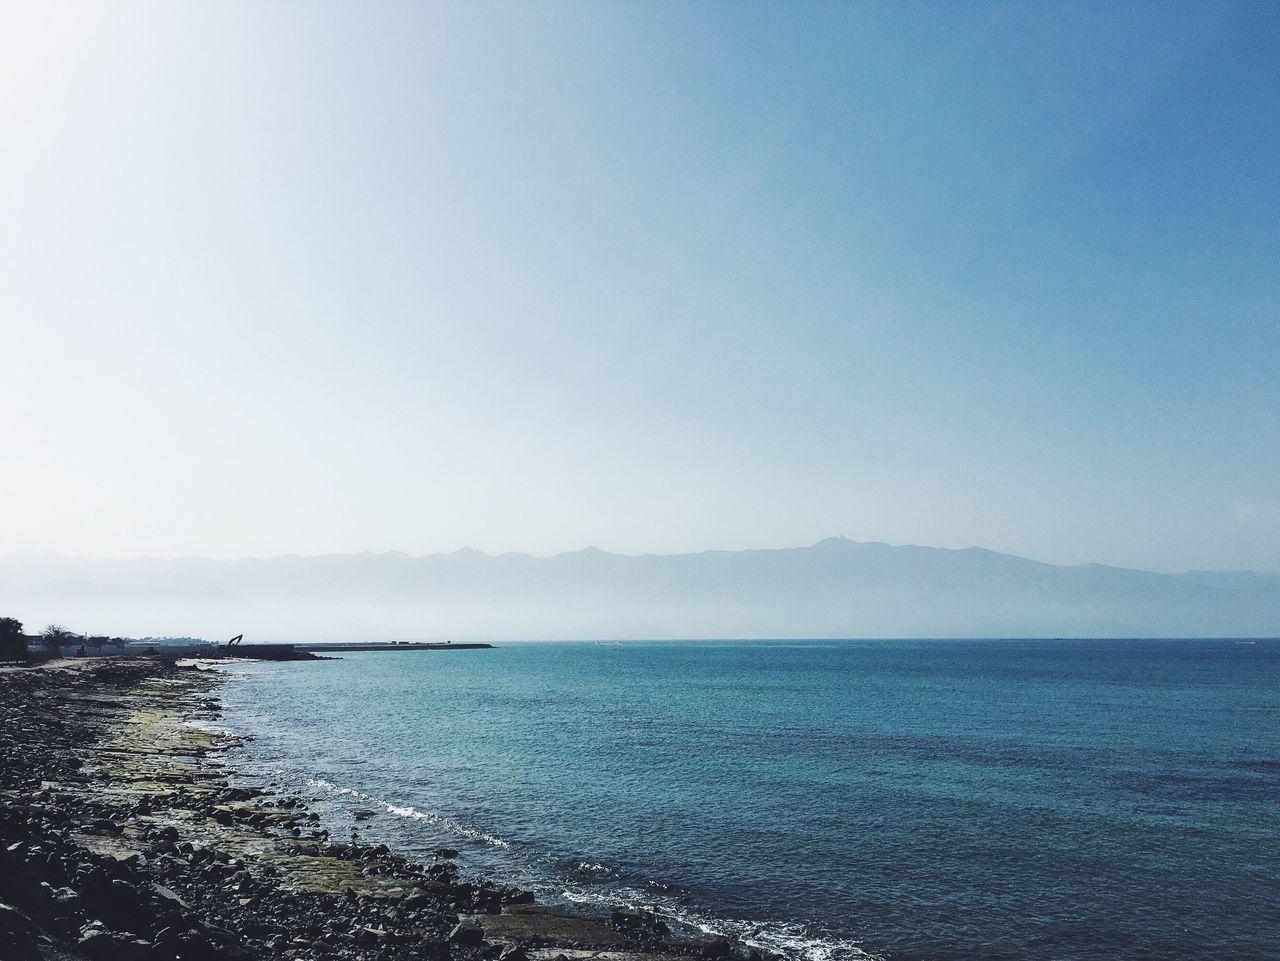 Coastal. Coast Coastline Coastal_collection Sea Sea And Sky Water Outdoors Fog Mist Mountains UAE Fujairah